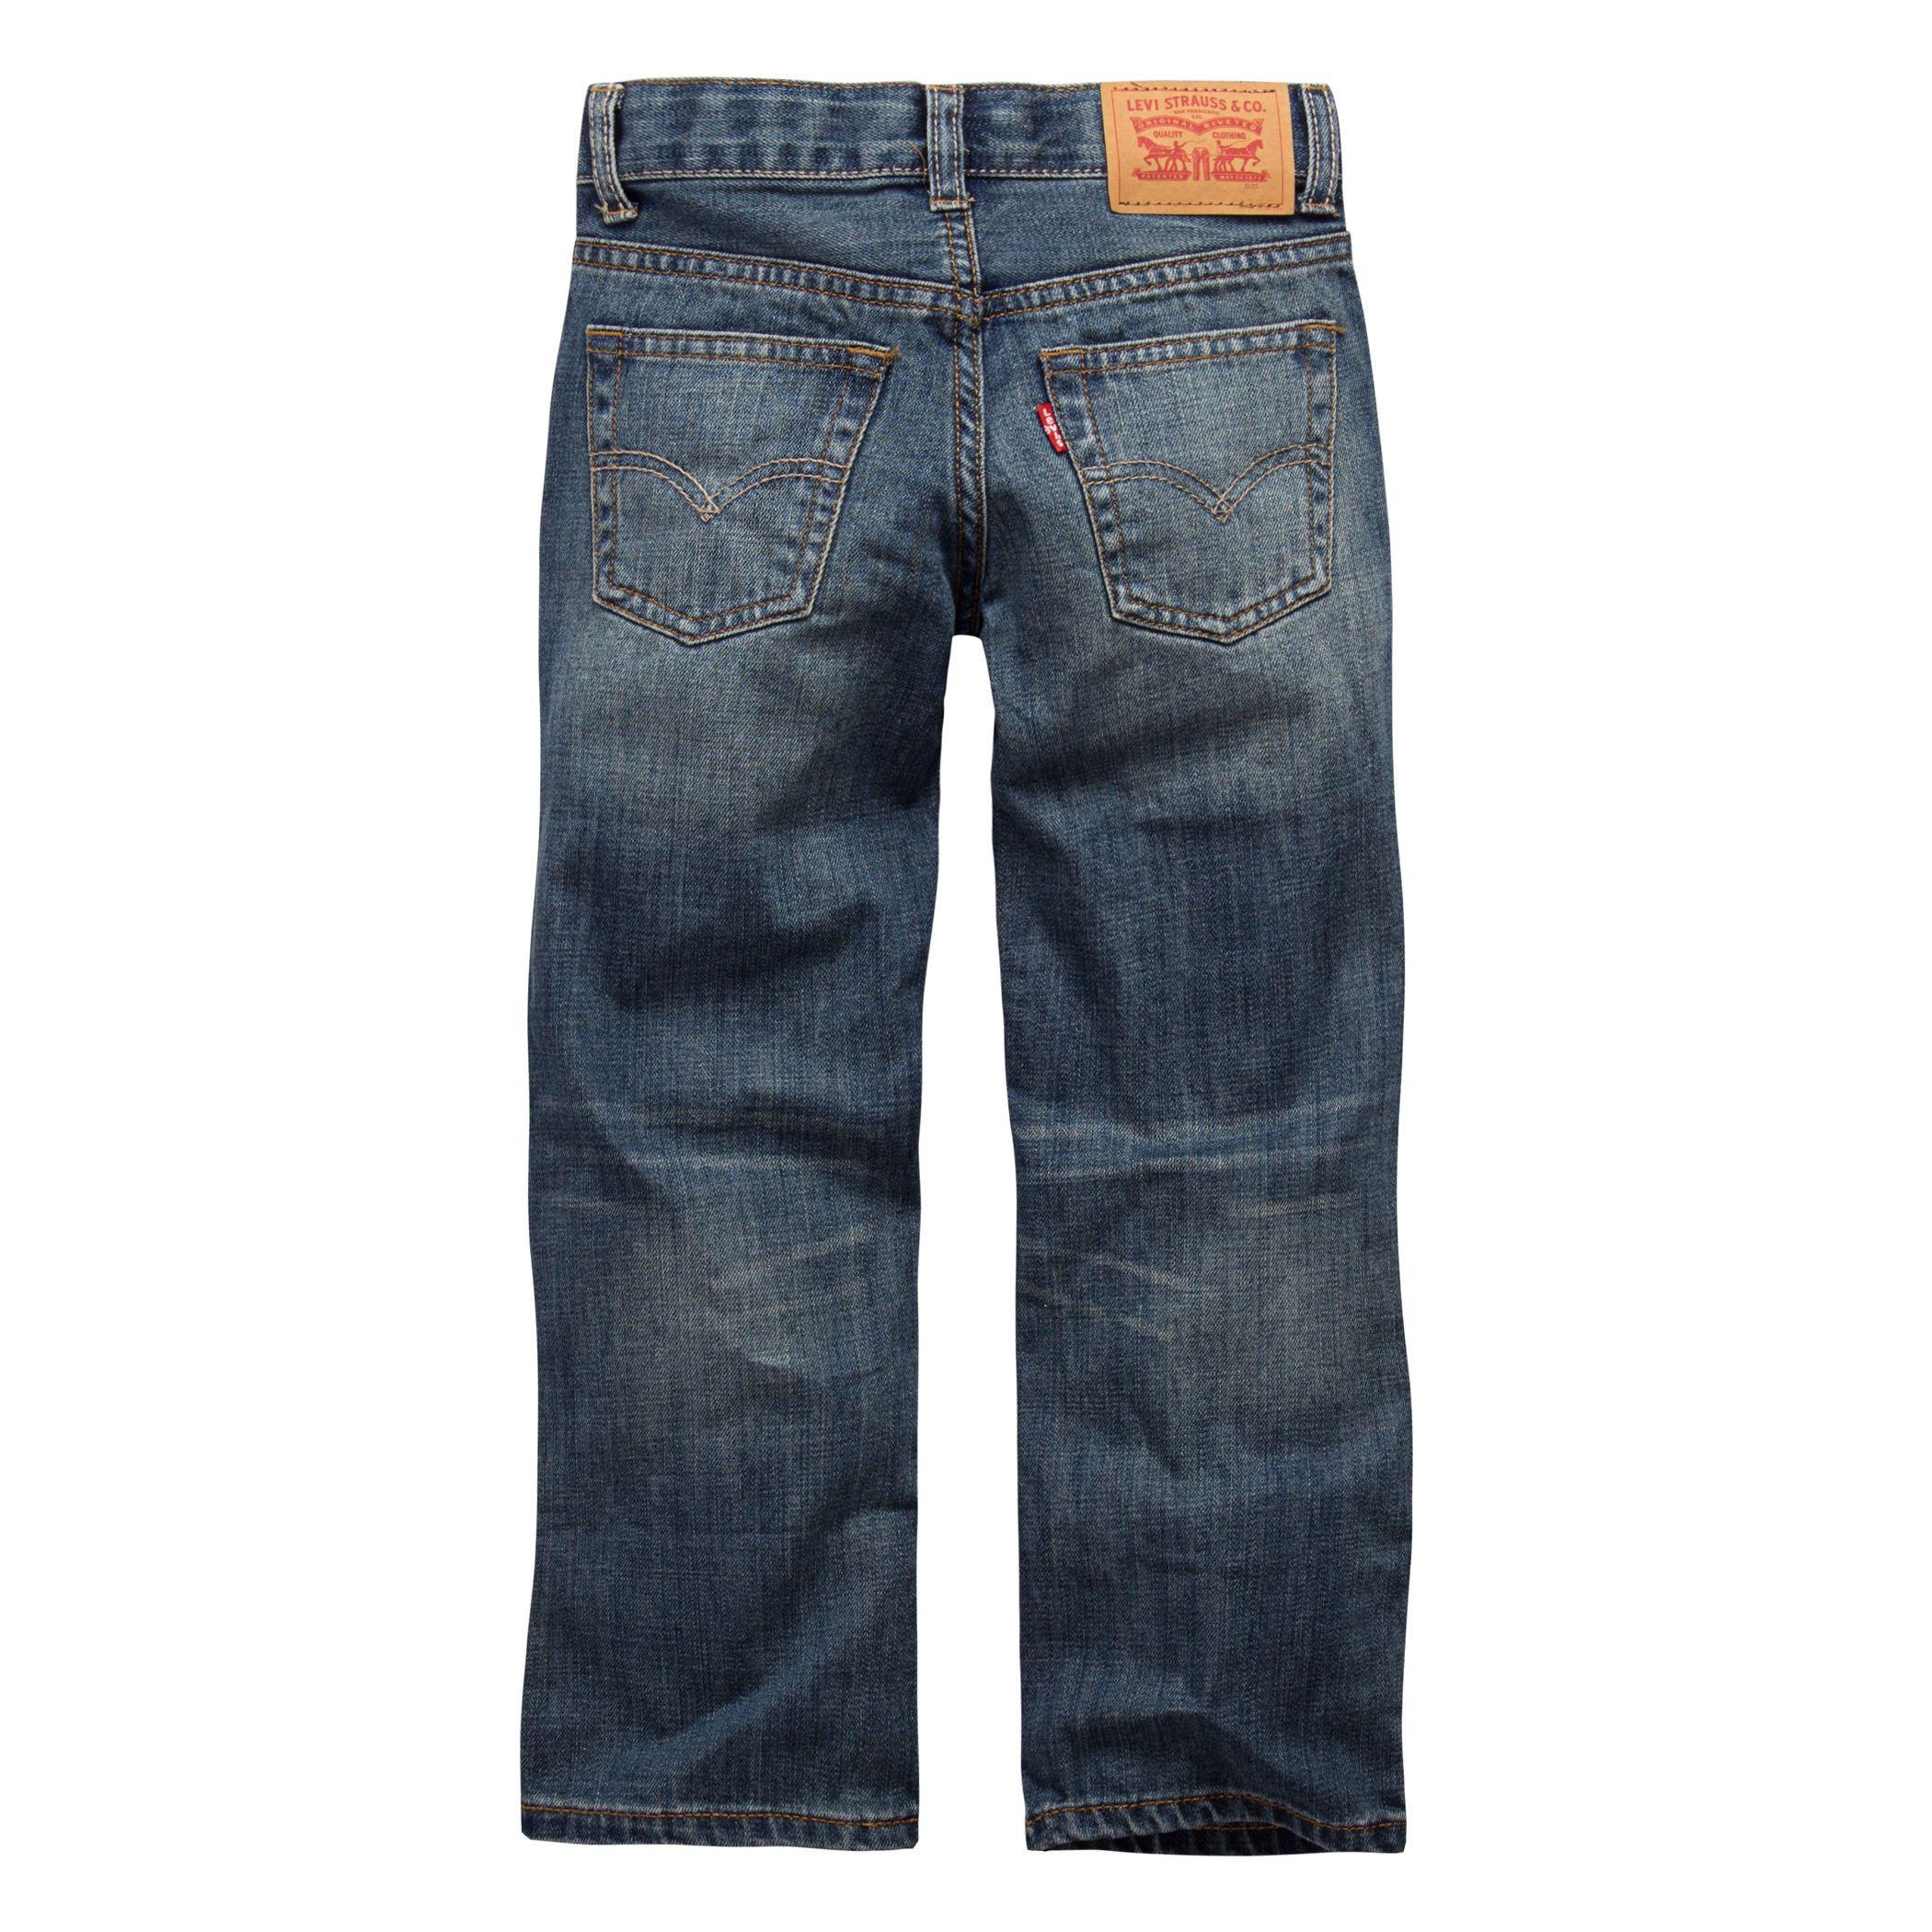 889342_ALT?wid=1000&hei=1000&op_sharpen=1 boys kids clothing kohl's,Childrens Clothes Under 5 Pounds